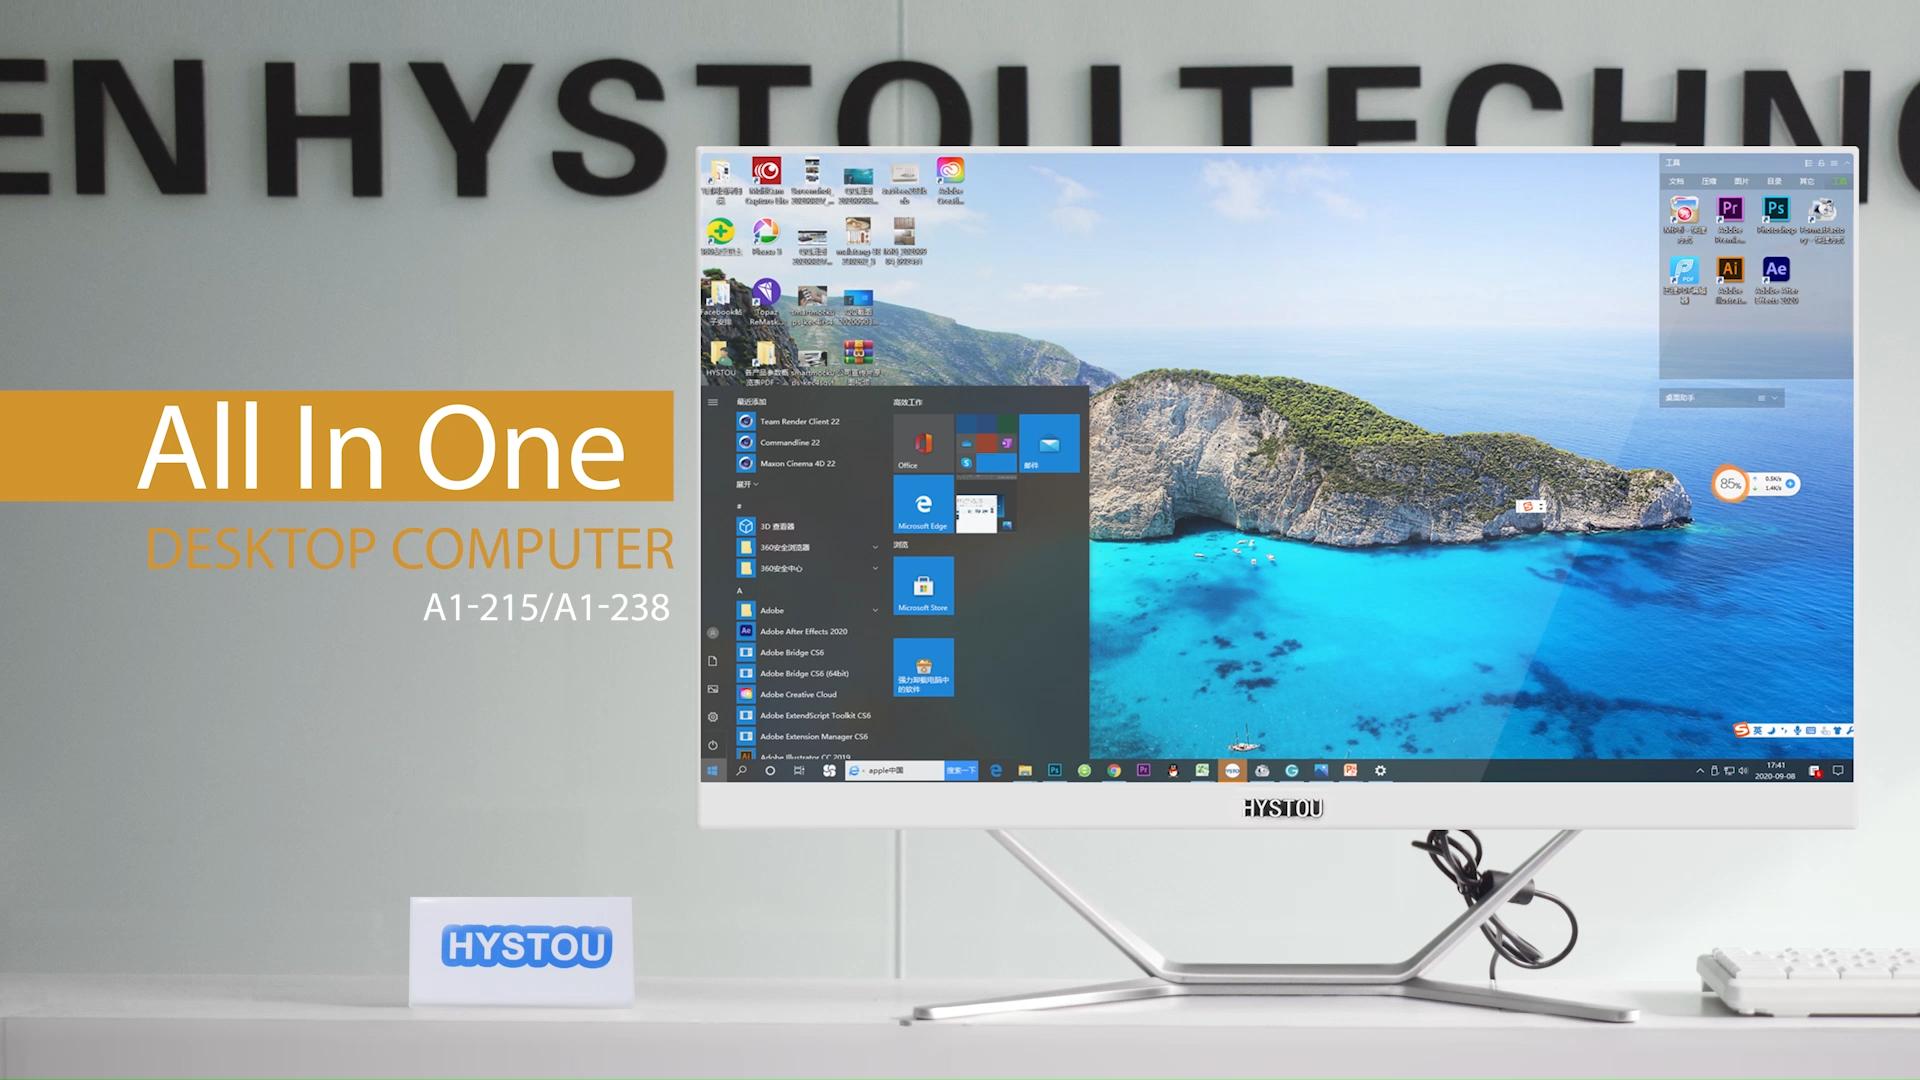 All In One Barebone PC i7 i5 i3 Desktop Computer Cheap 21.5インチ23.8インチ4G 8G RAM 256G SSD Gaming AllオールインワンPc